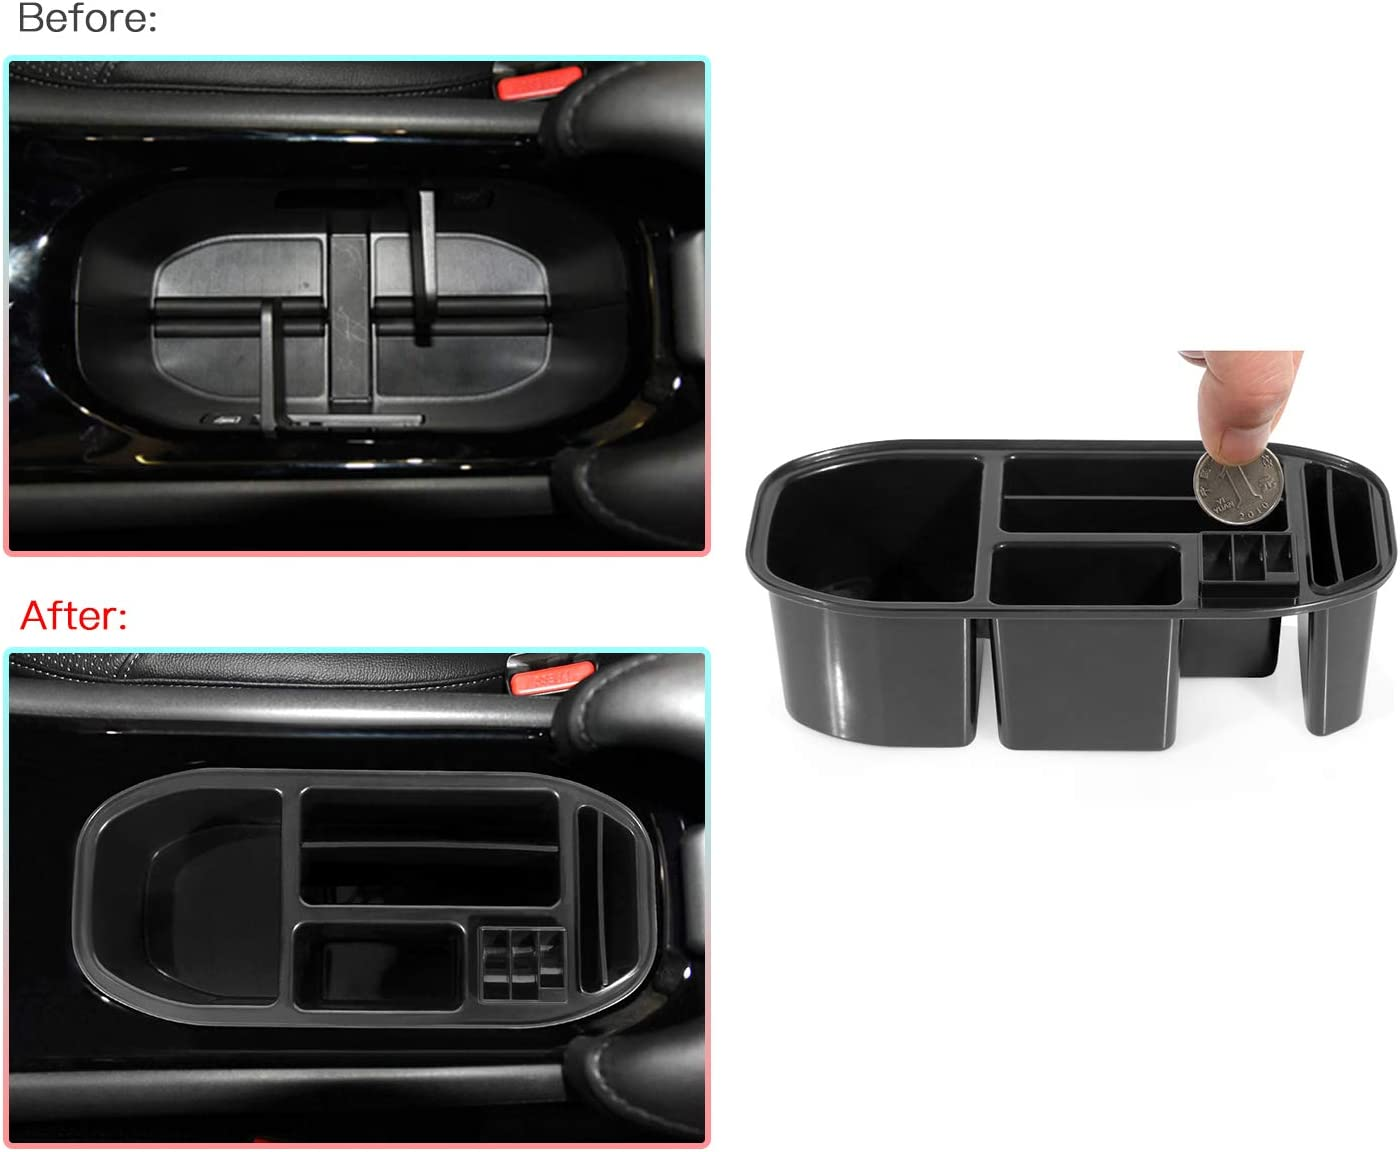 Change Holder Center Console Storage Box CDEFG Car Armrest Box Storage Cup Holder Coins Organizer Case for 2016-2019 HRV